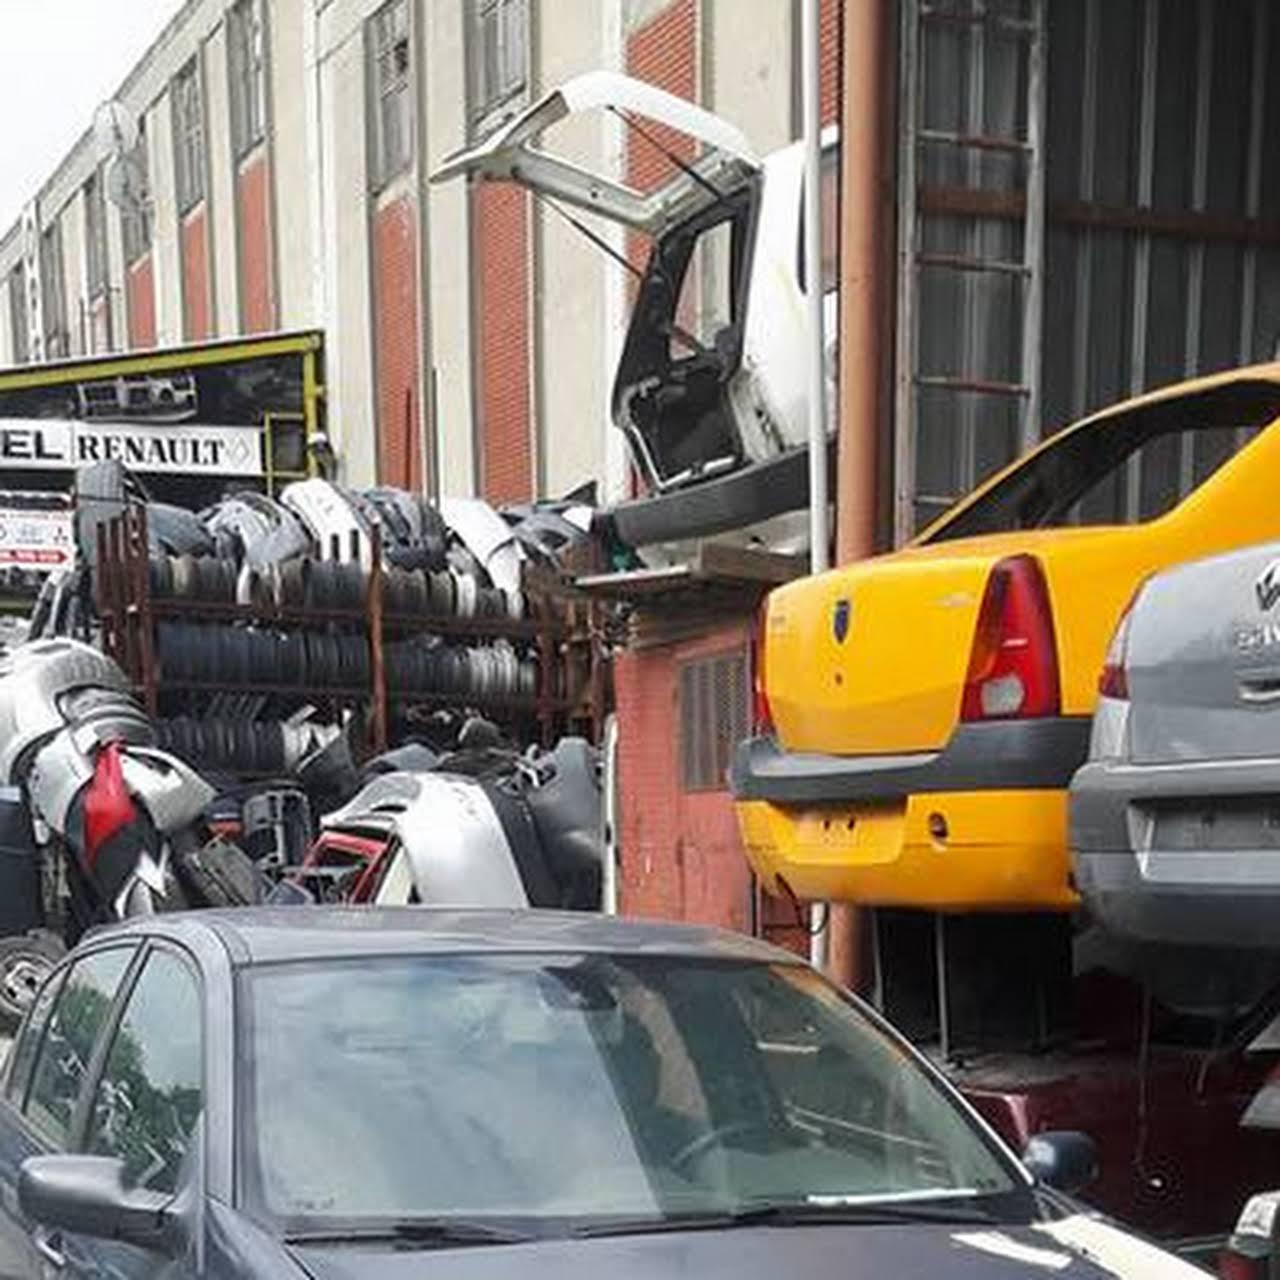 Renault Cikma Yedek Parca Cikma Renault Parcalari Ikitelli Ataturk Oto Sanayi Sitesi Otomobil Yedek Parca Magazasi